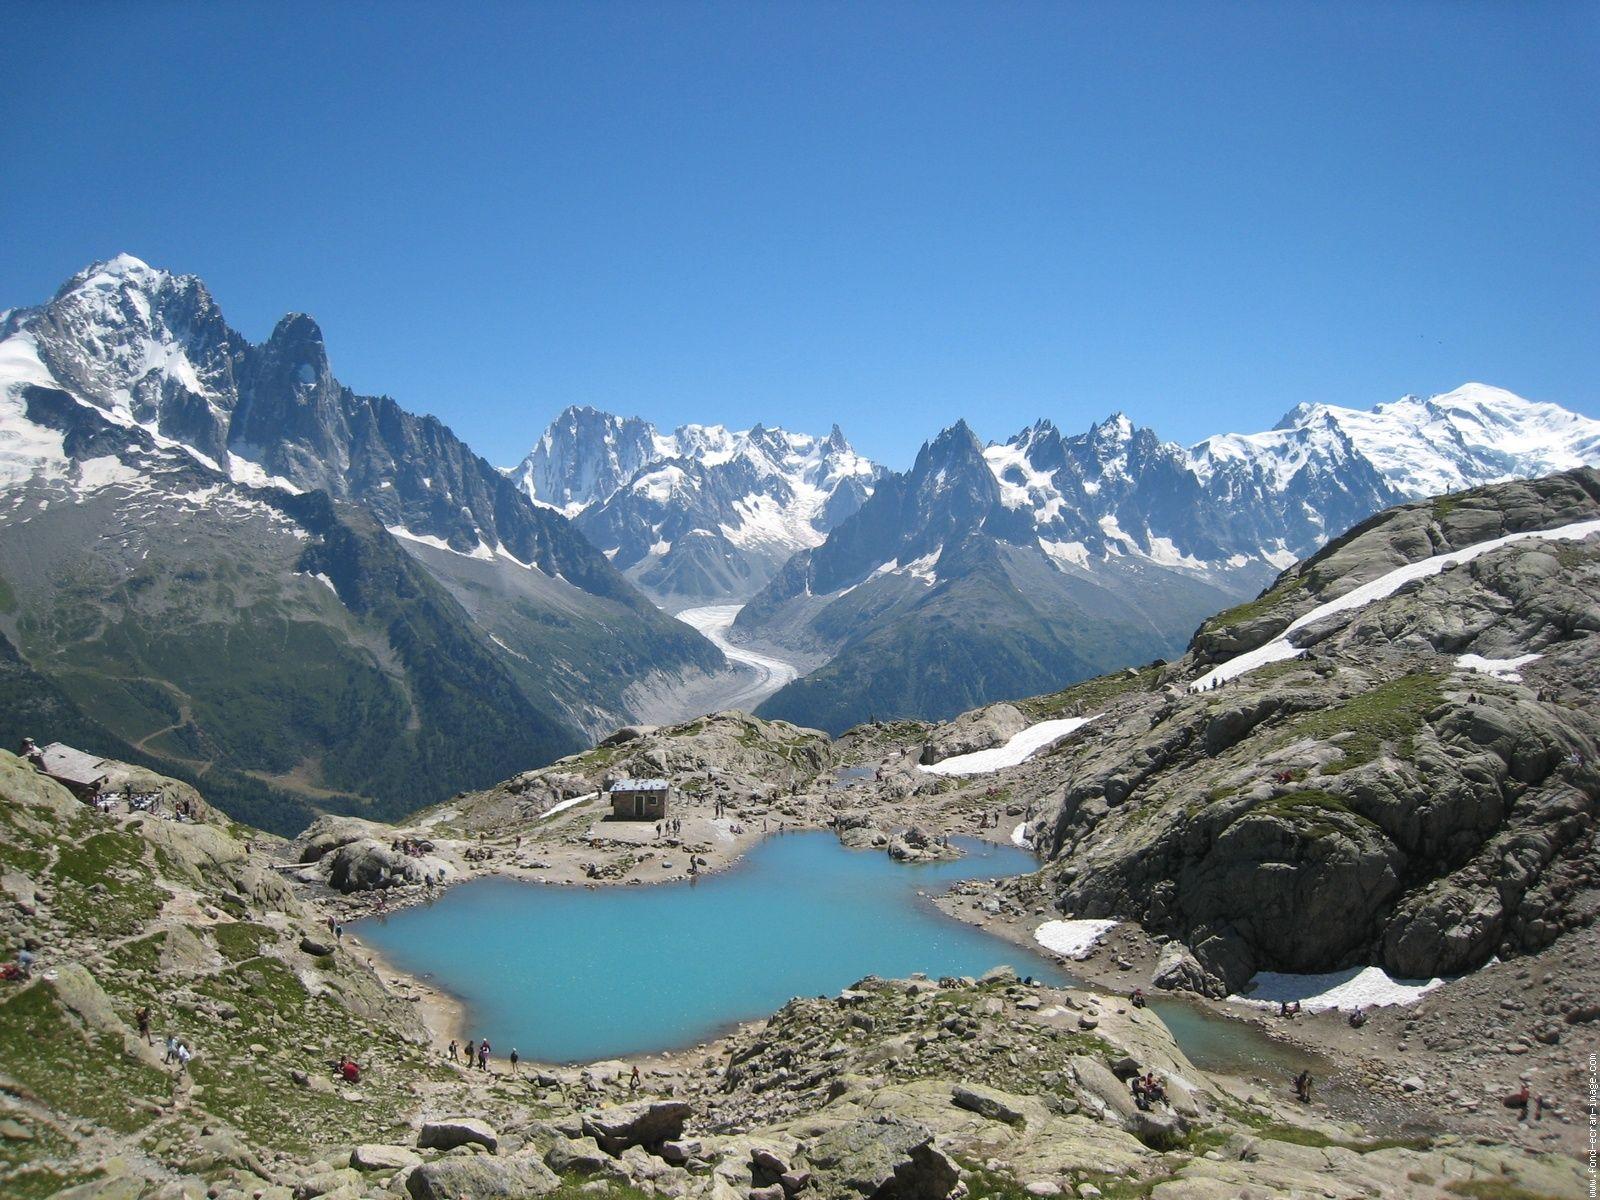 Randonnee Pedestre Orbey Lac Blanc Blog Des Fans De Randonnee En Montagne Lac Blanc Randonnee Pedestre Lac